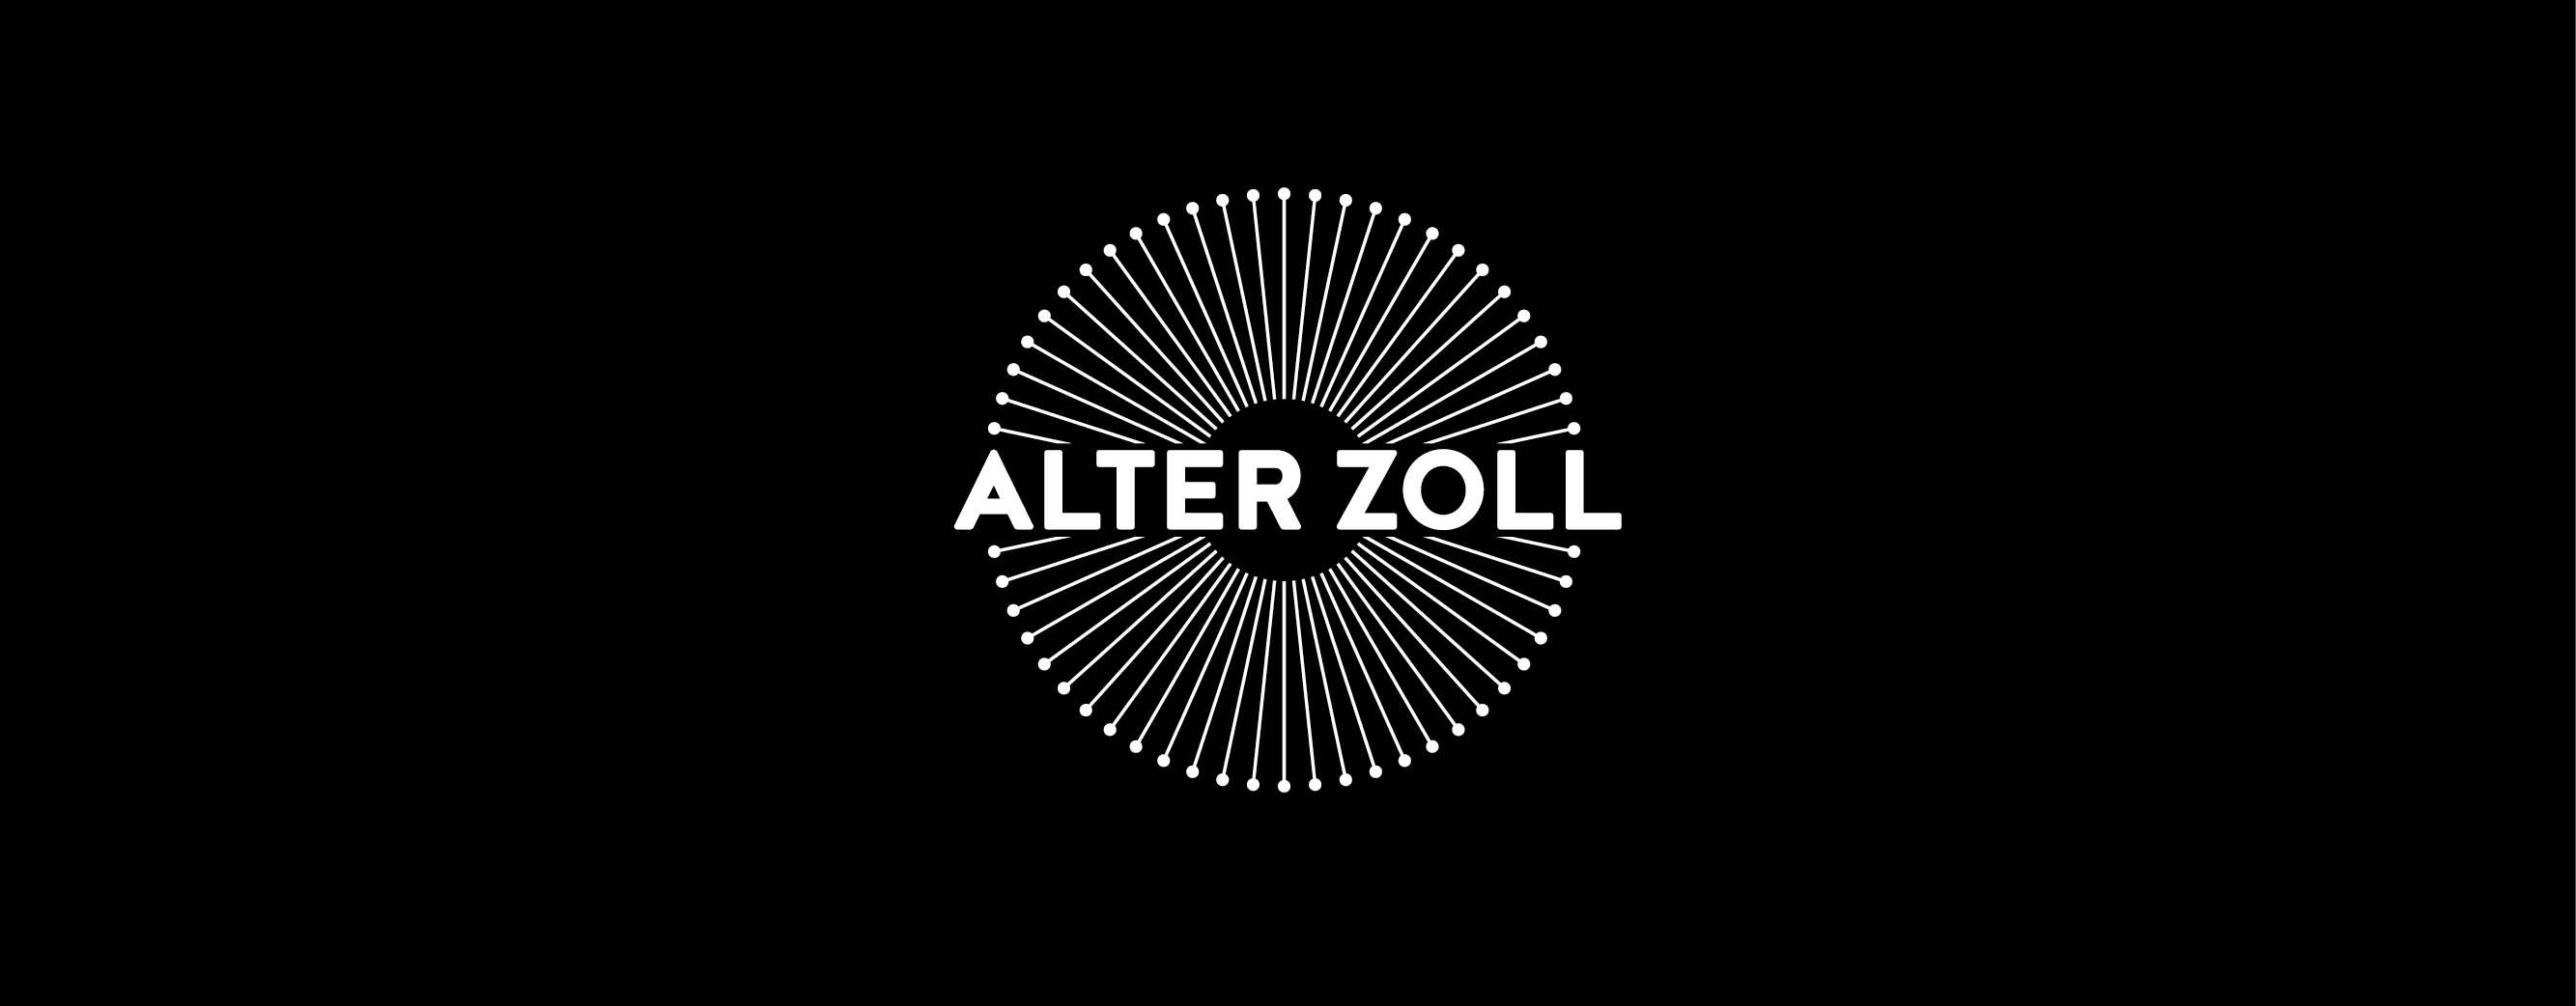 Alter Zoll Restaurant